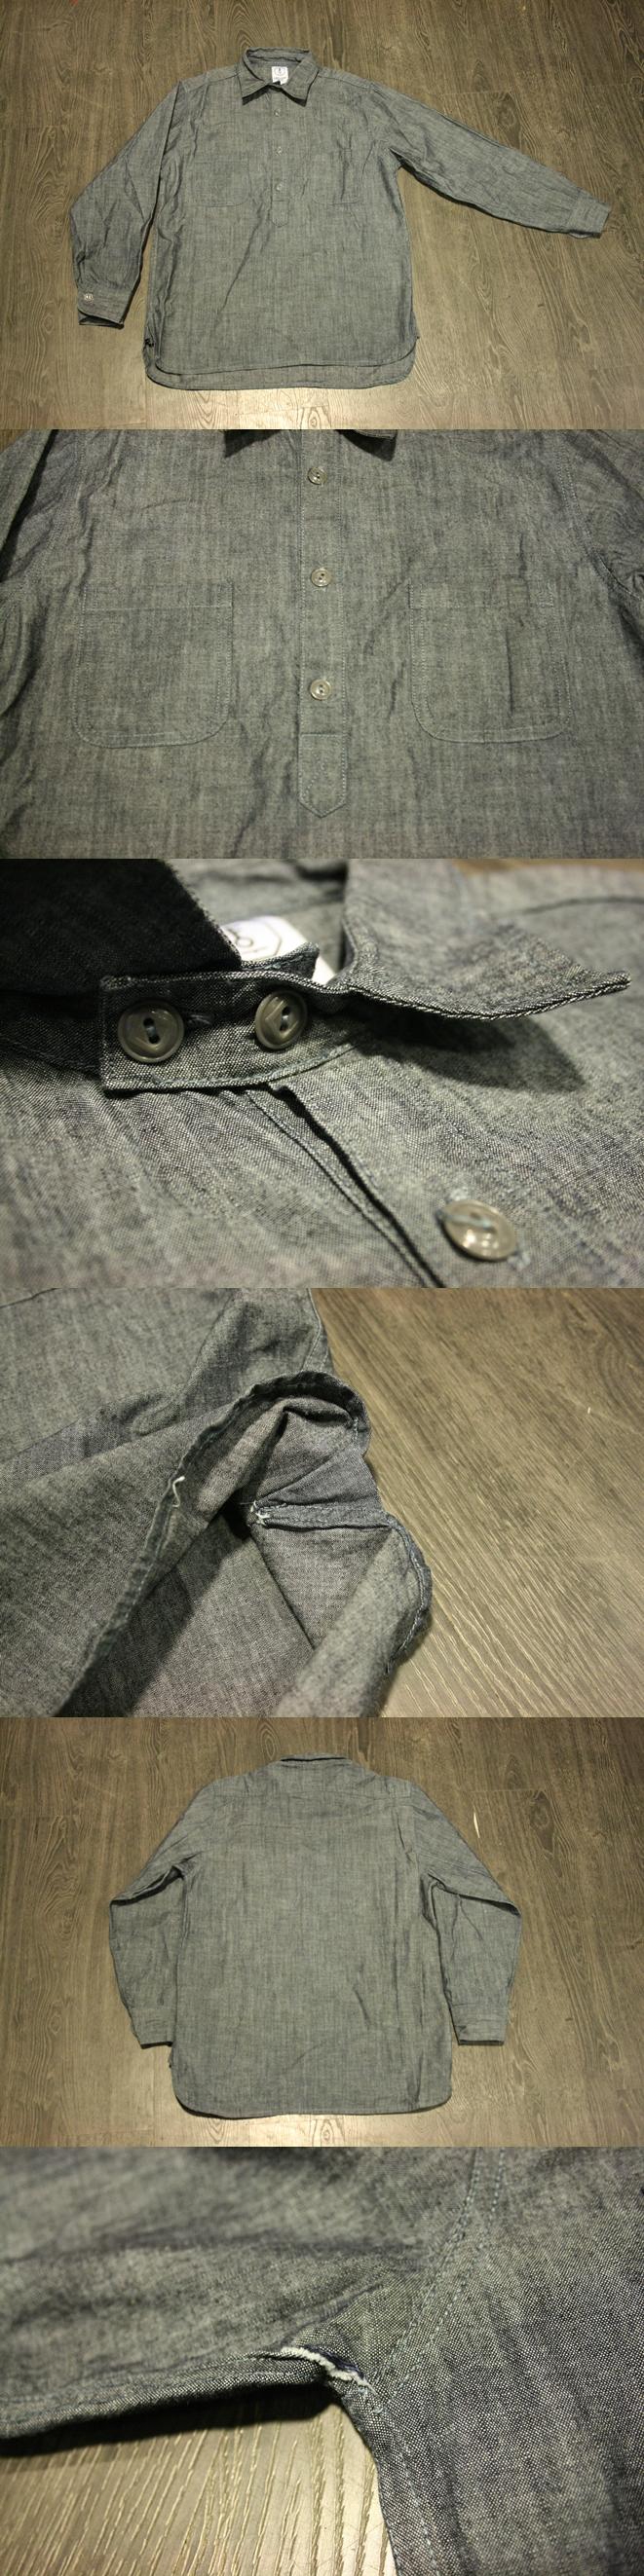 Folta&Co Half Button Shirt